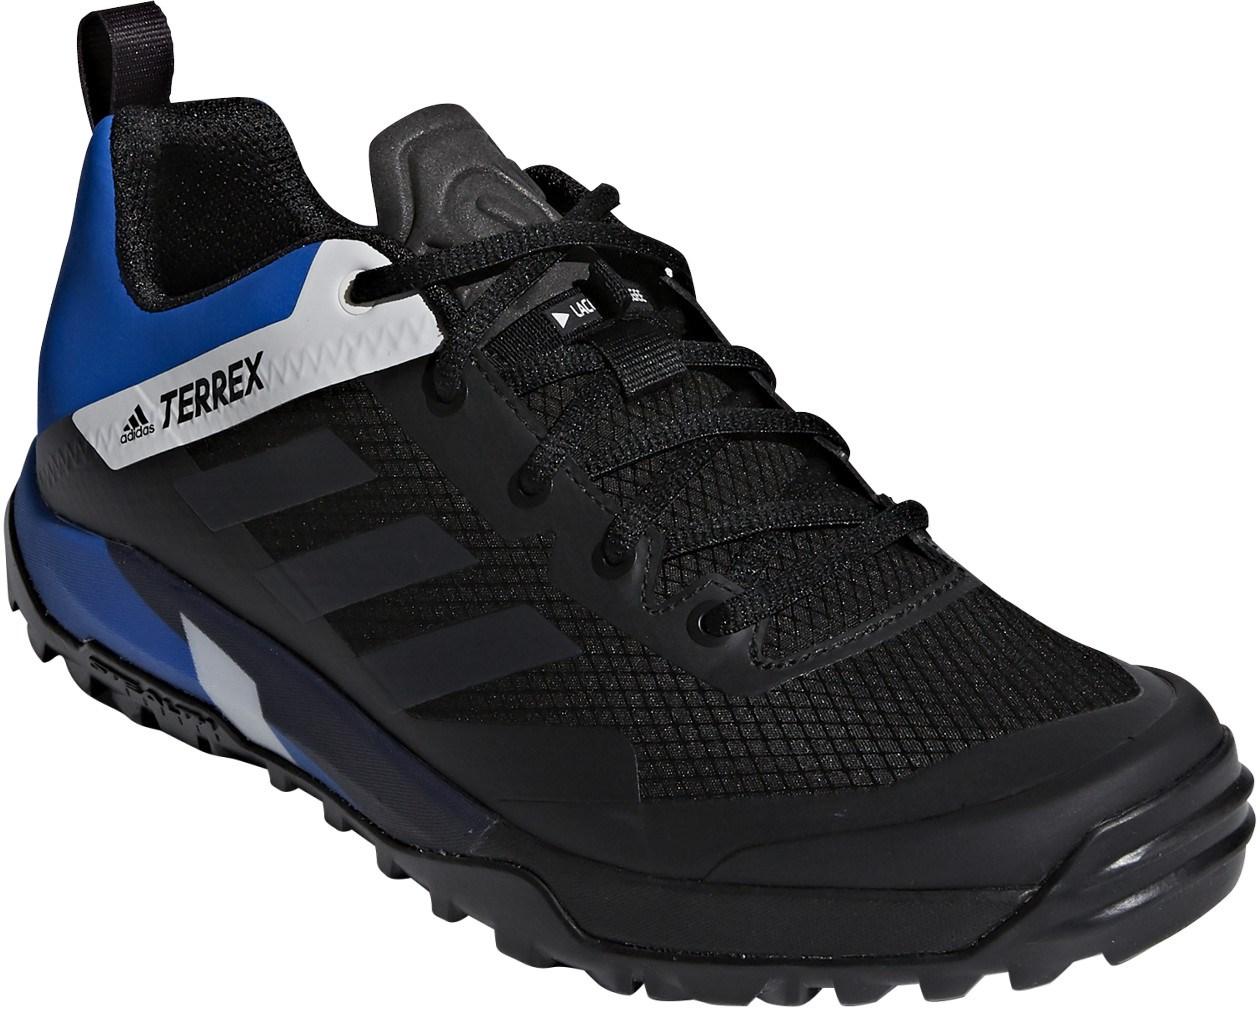 Disponible lb cavidad  Adidas Terrex Trail Cross SL Hiking / All Mountain Flat Shoes £87.95